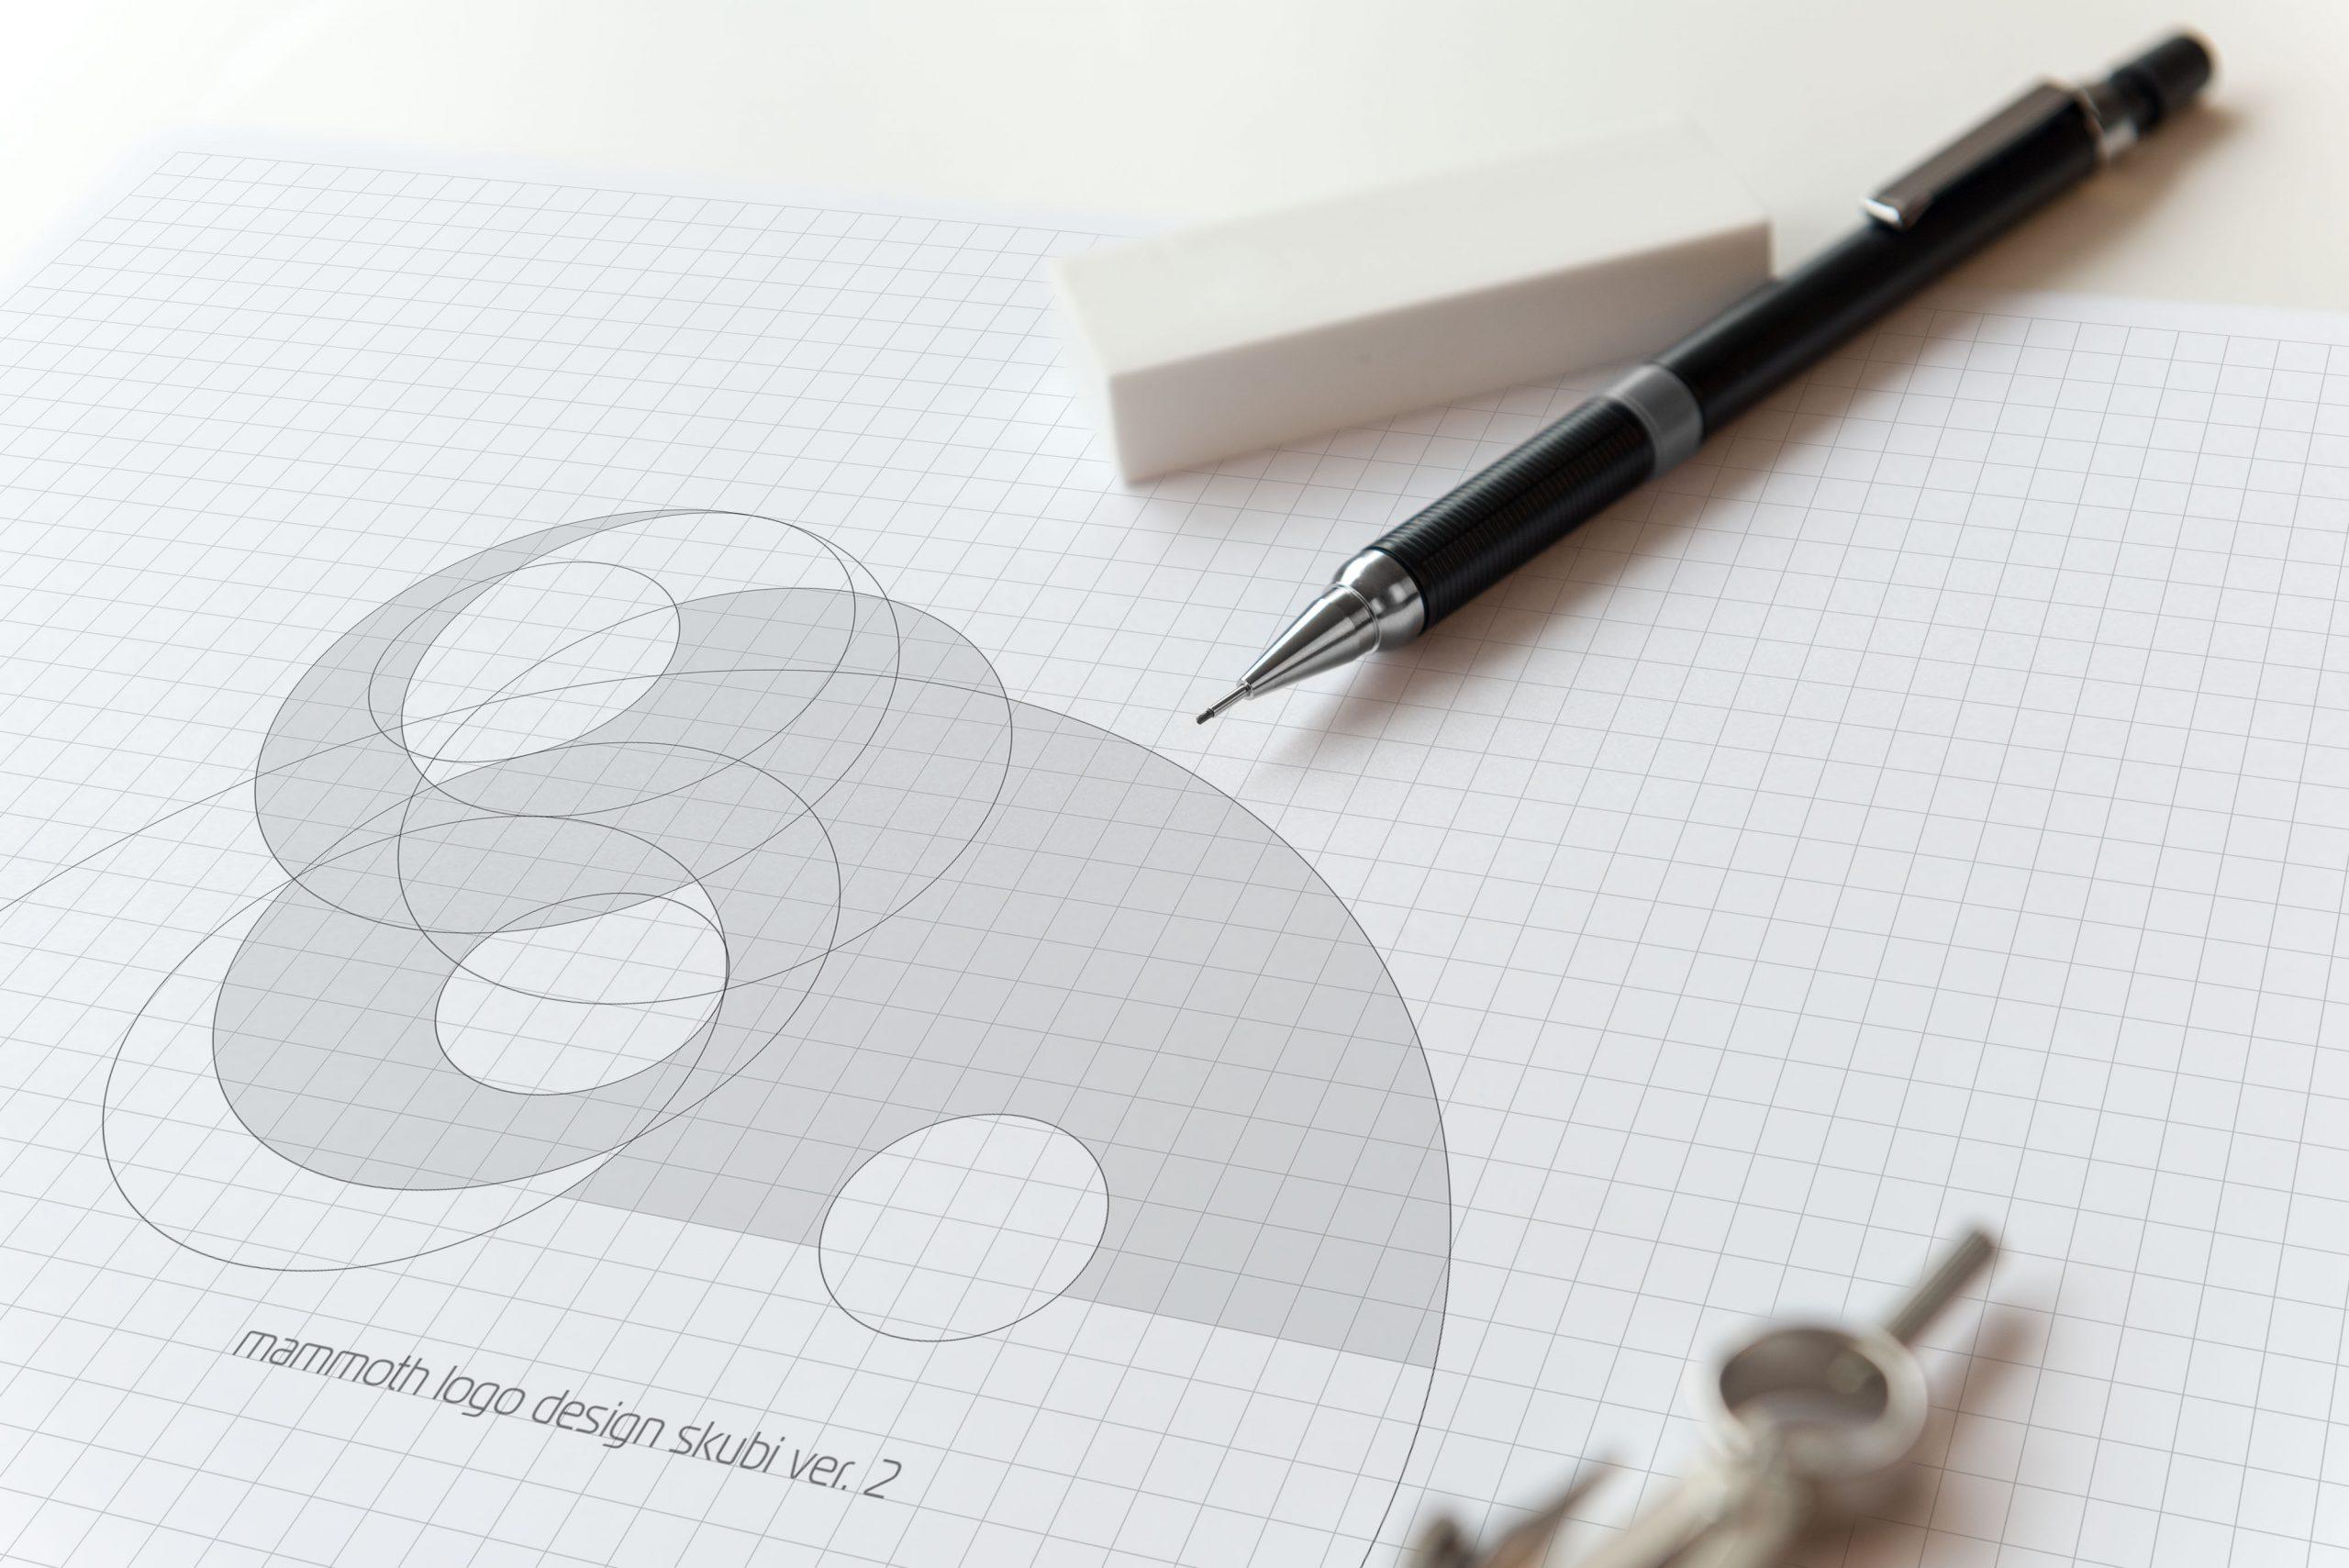 mockup logo 1 szkic